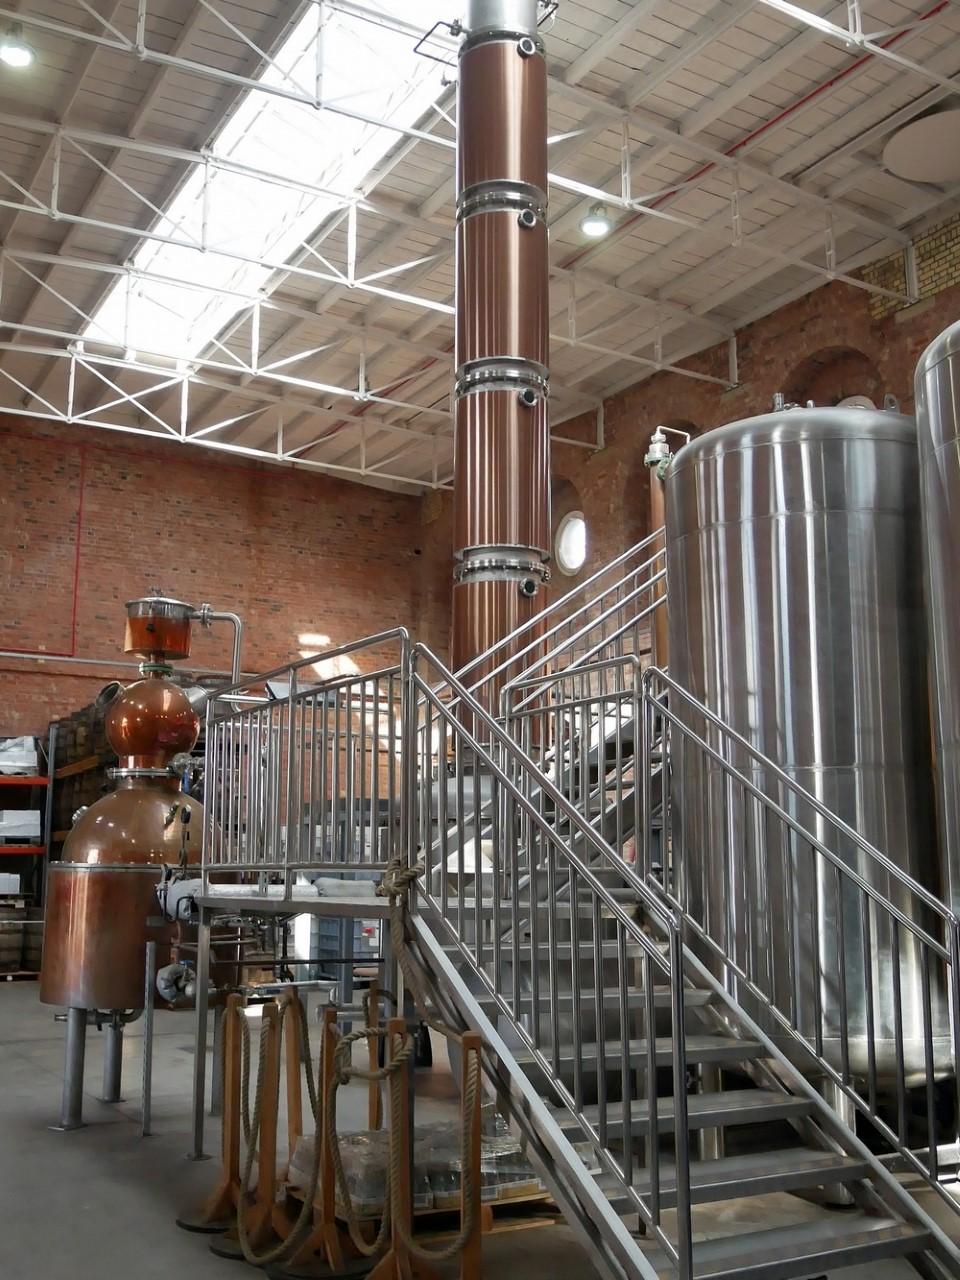 Column and pot still at the Copper Rivet distillery